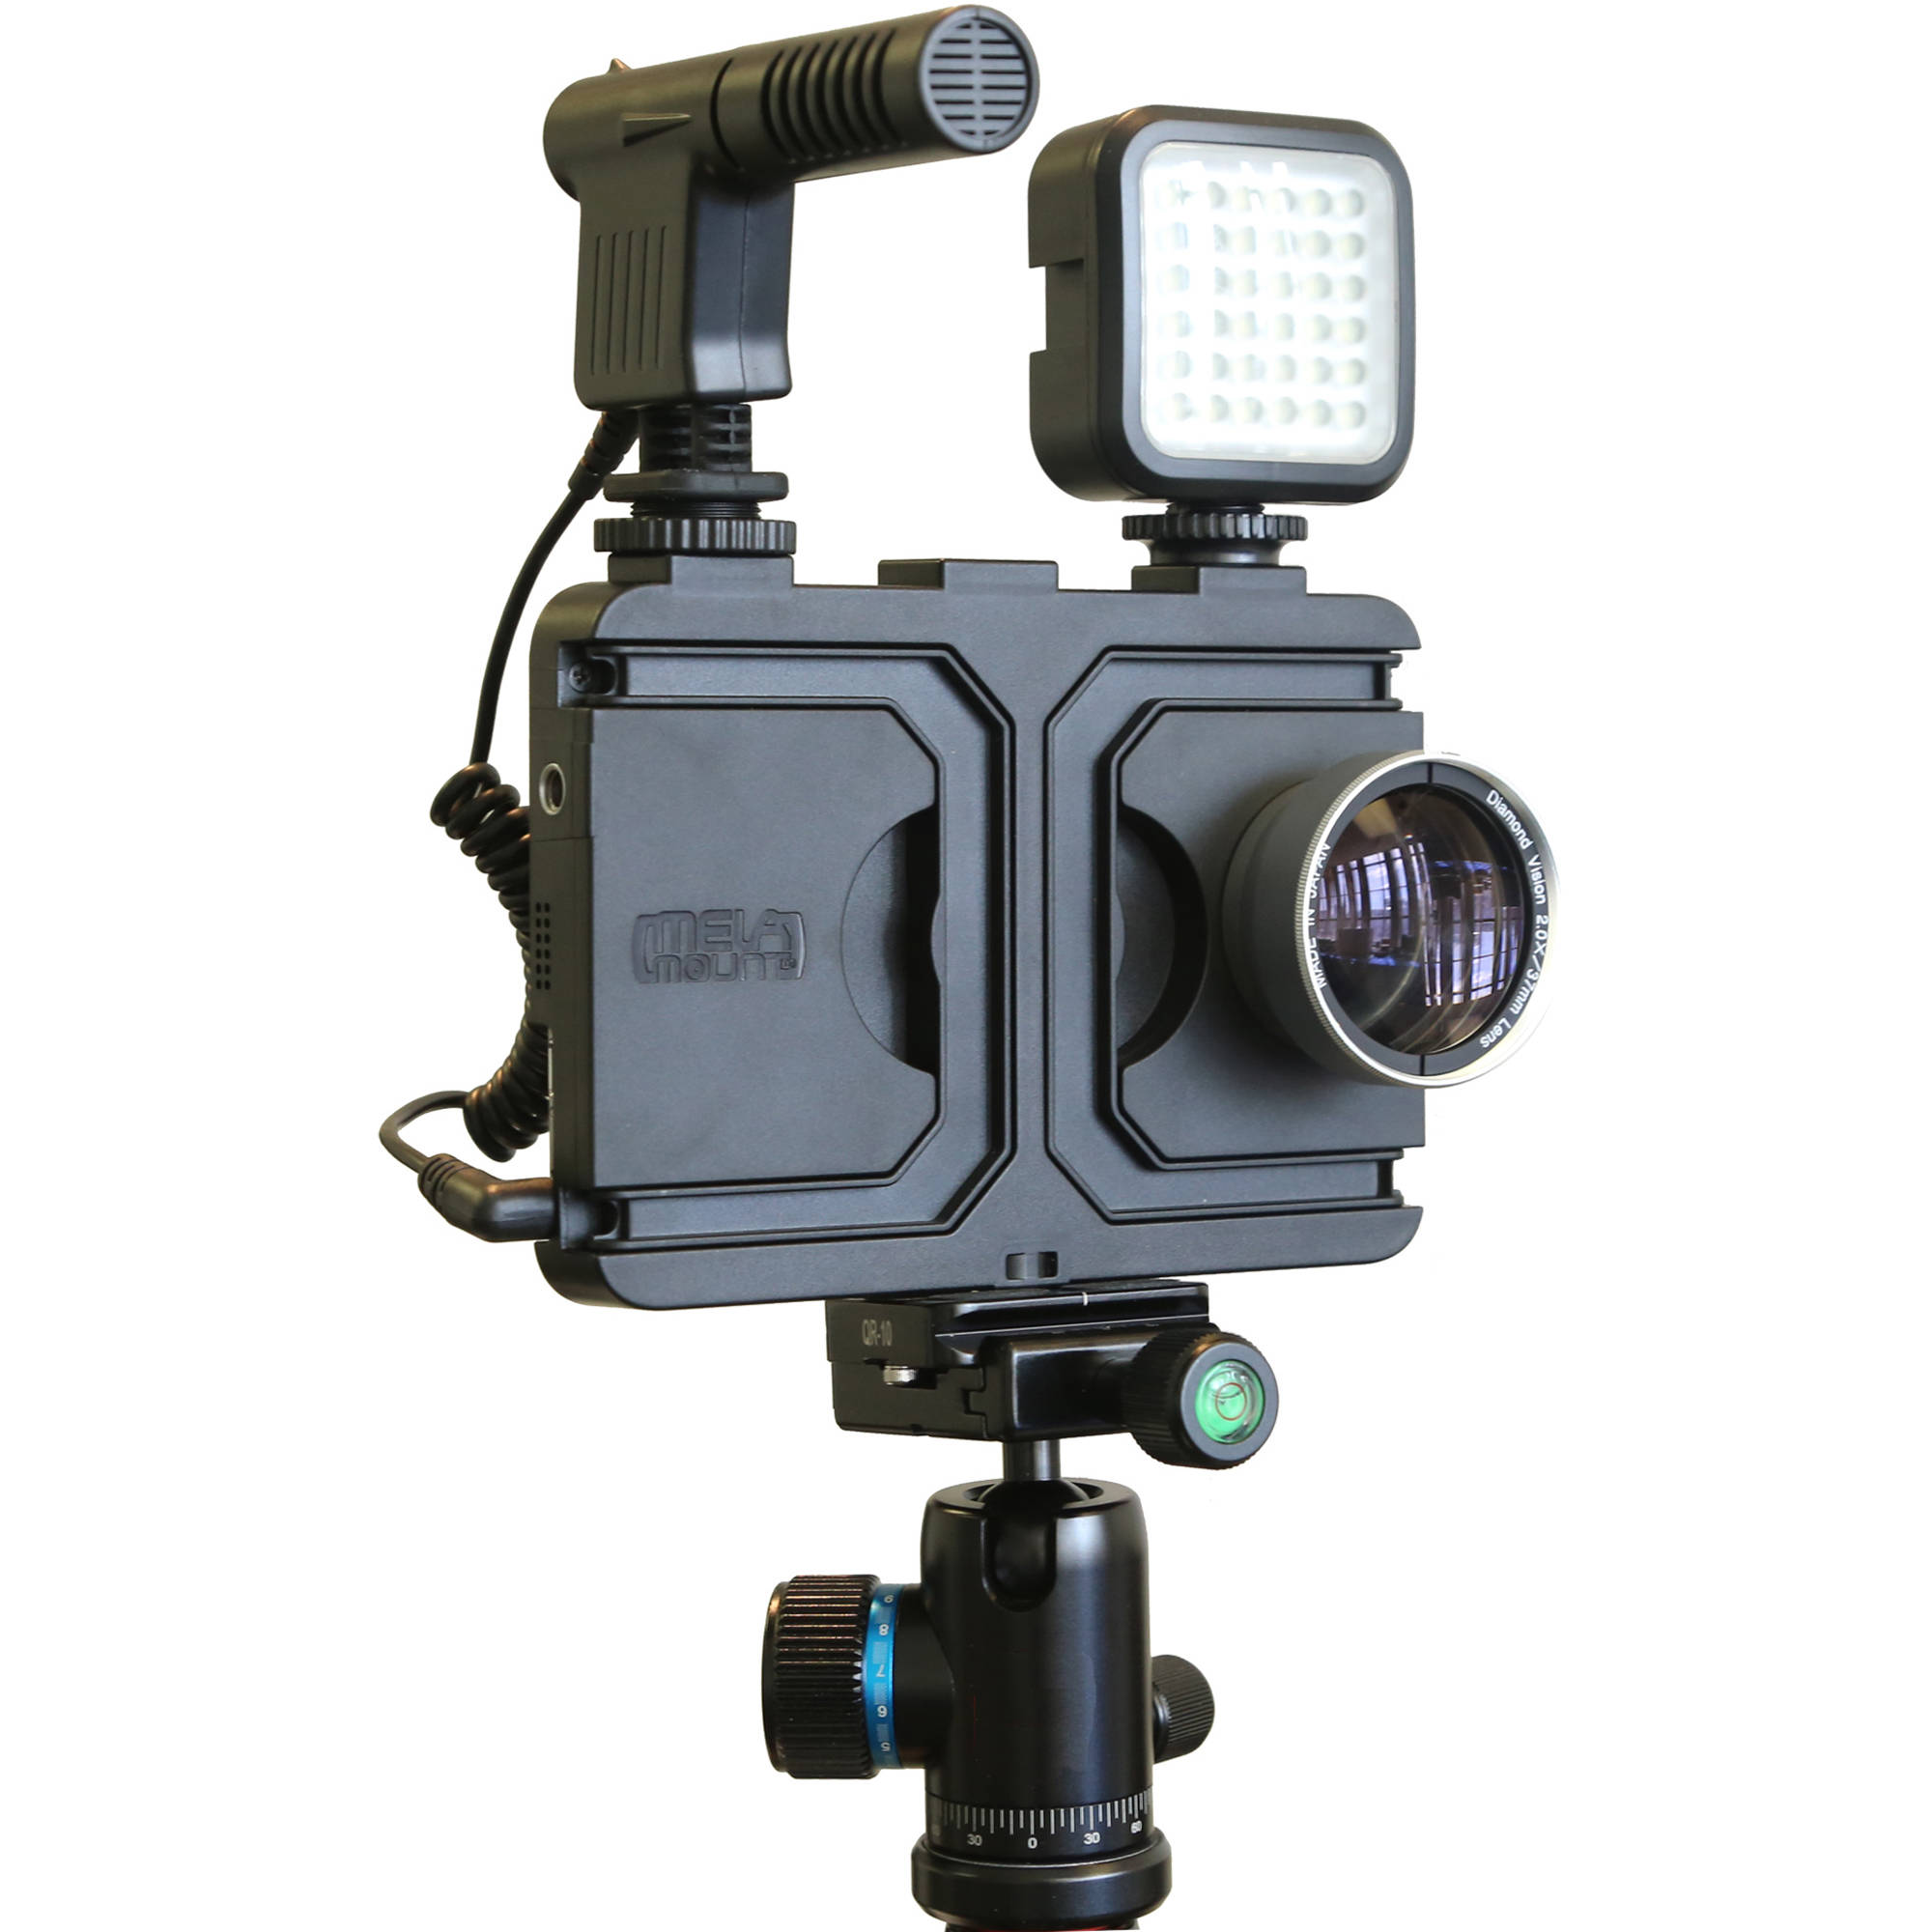 best service bbf8c e4021 Melamount Video Stabilizer Pro Multimedia Rig Case for iPhone 7 Plus/8 Plus